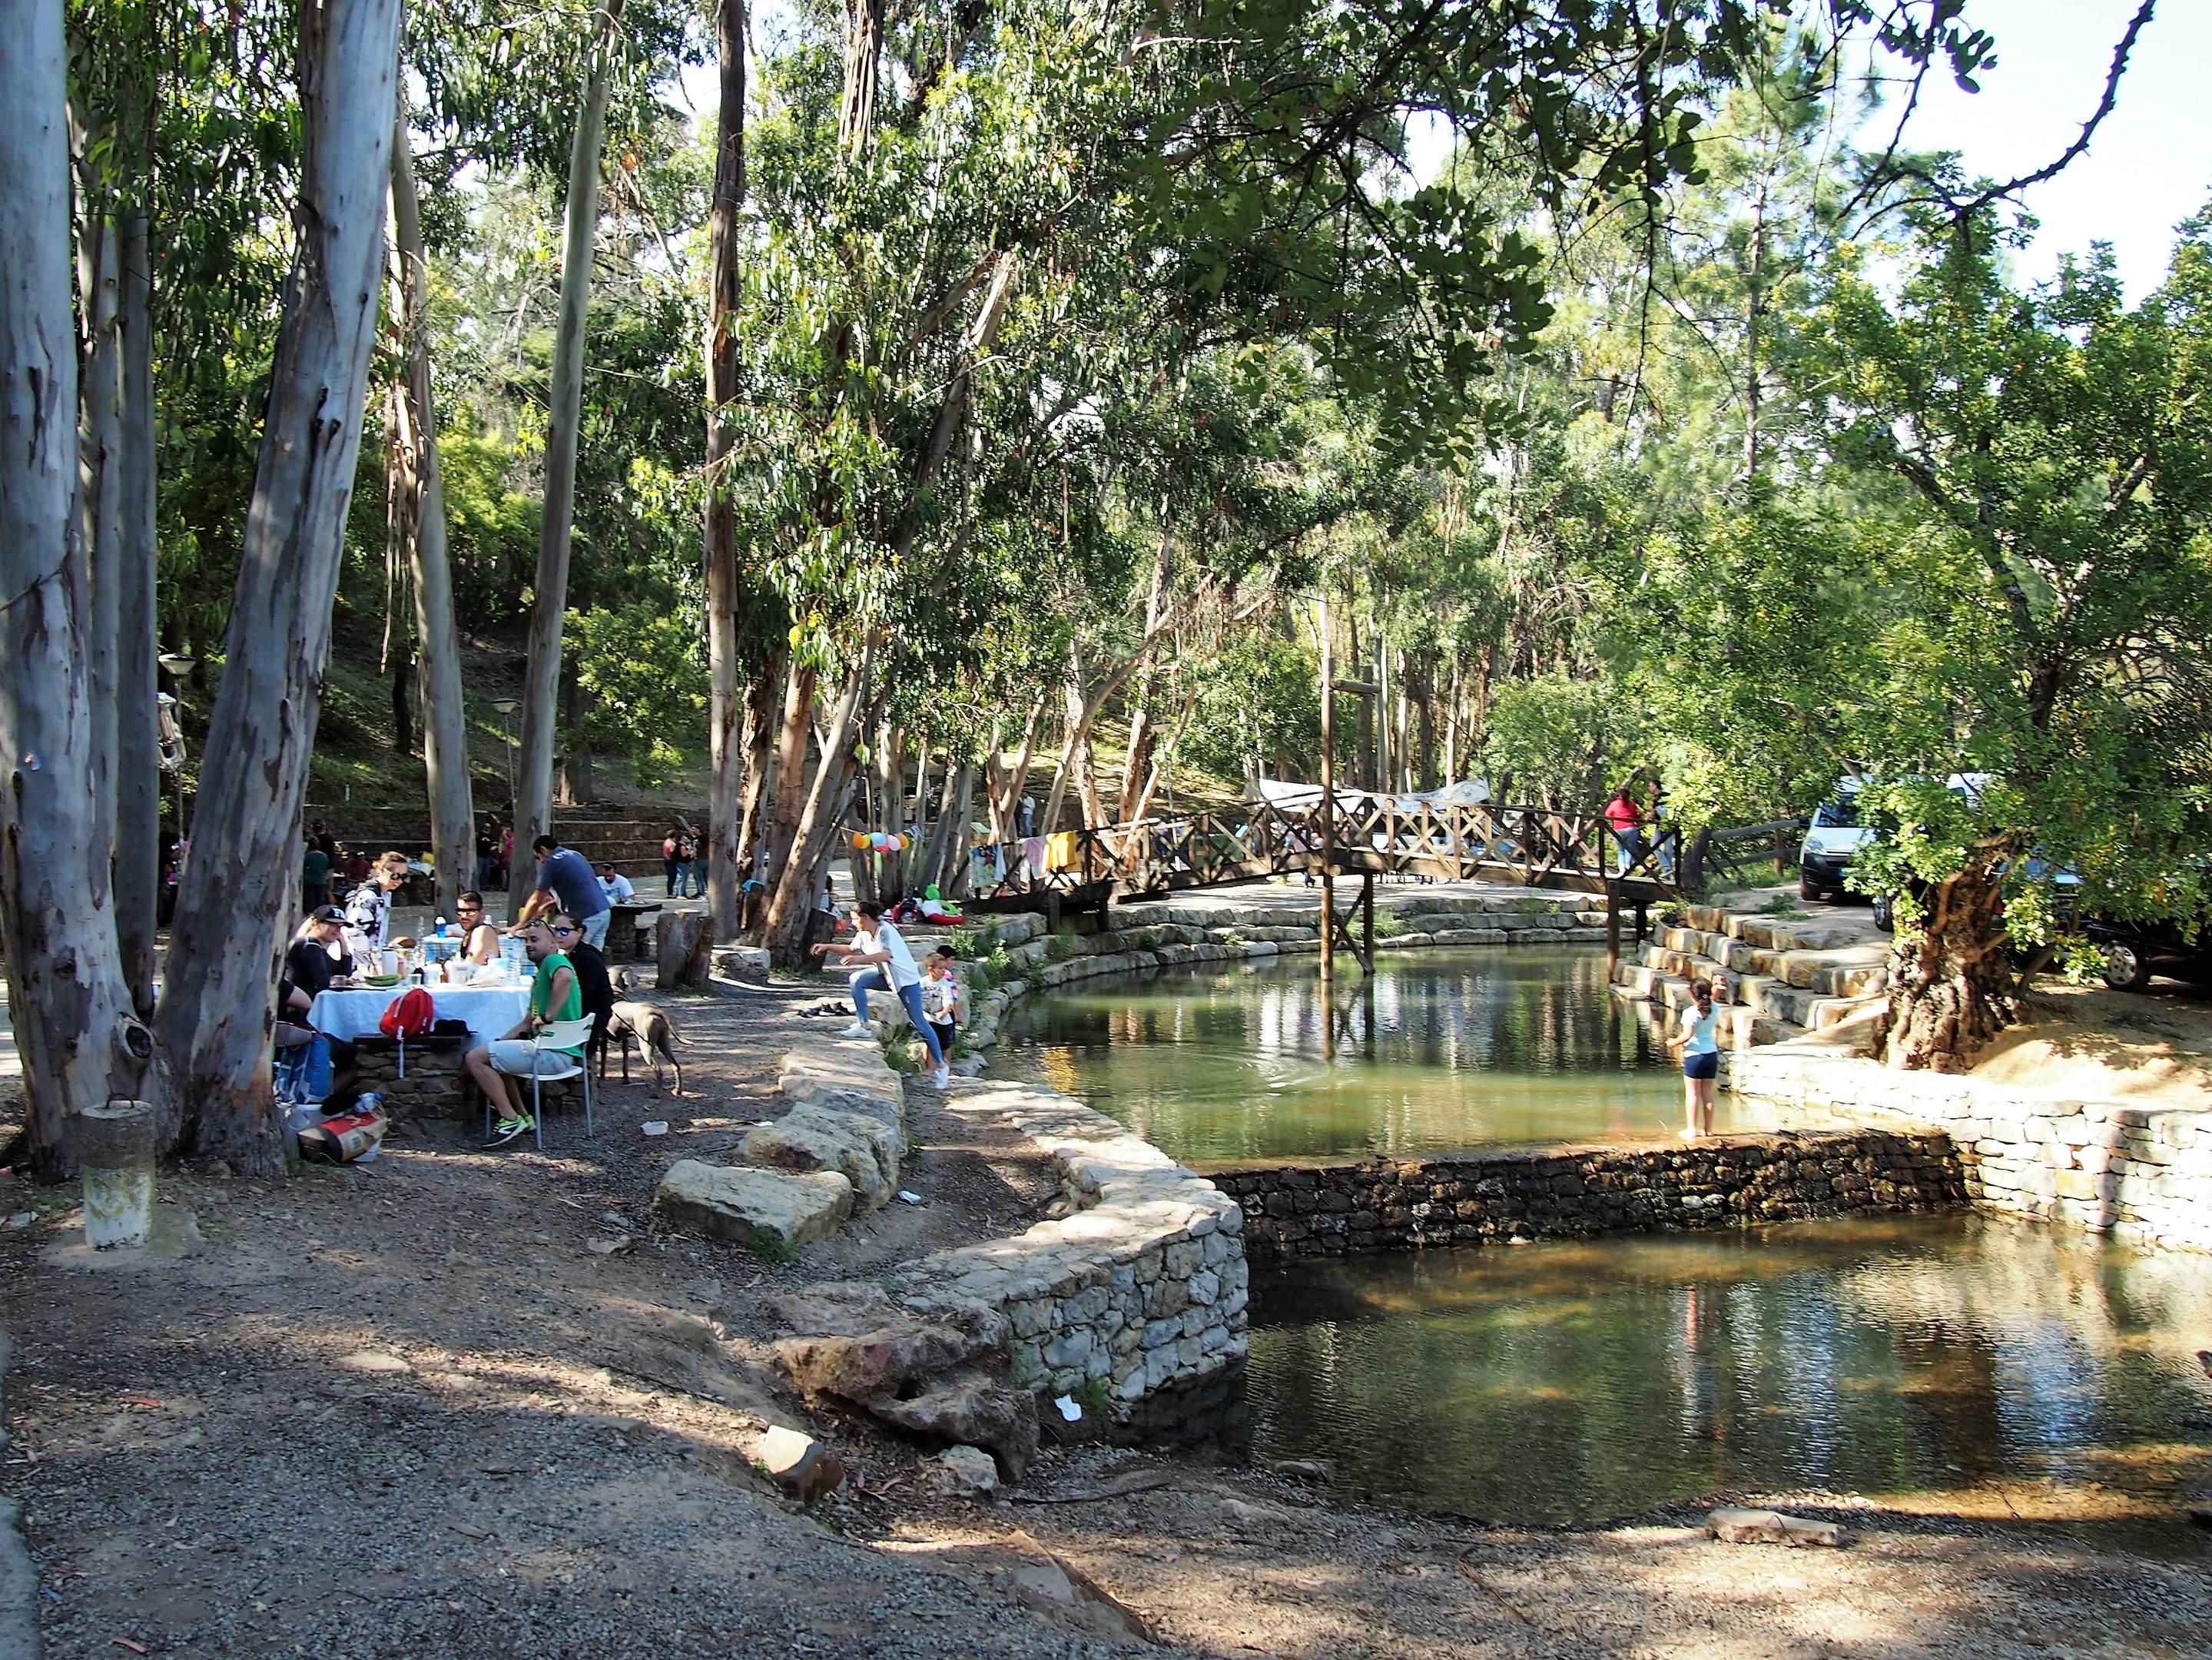 The park of Fonte Férrea, in São Brás de Alportel